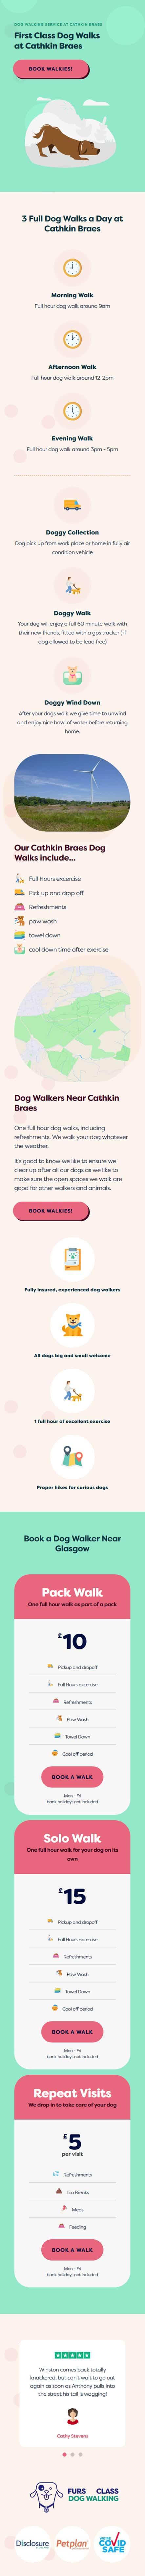 mobile booking website designers in Hamilton